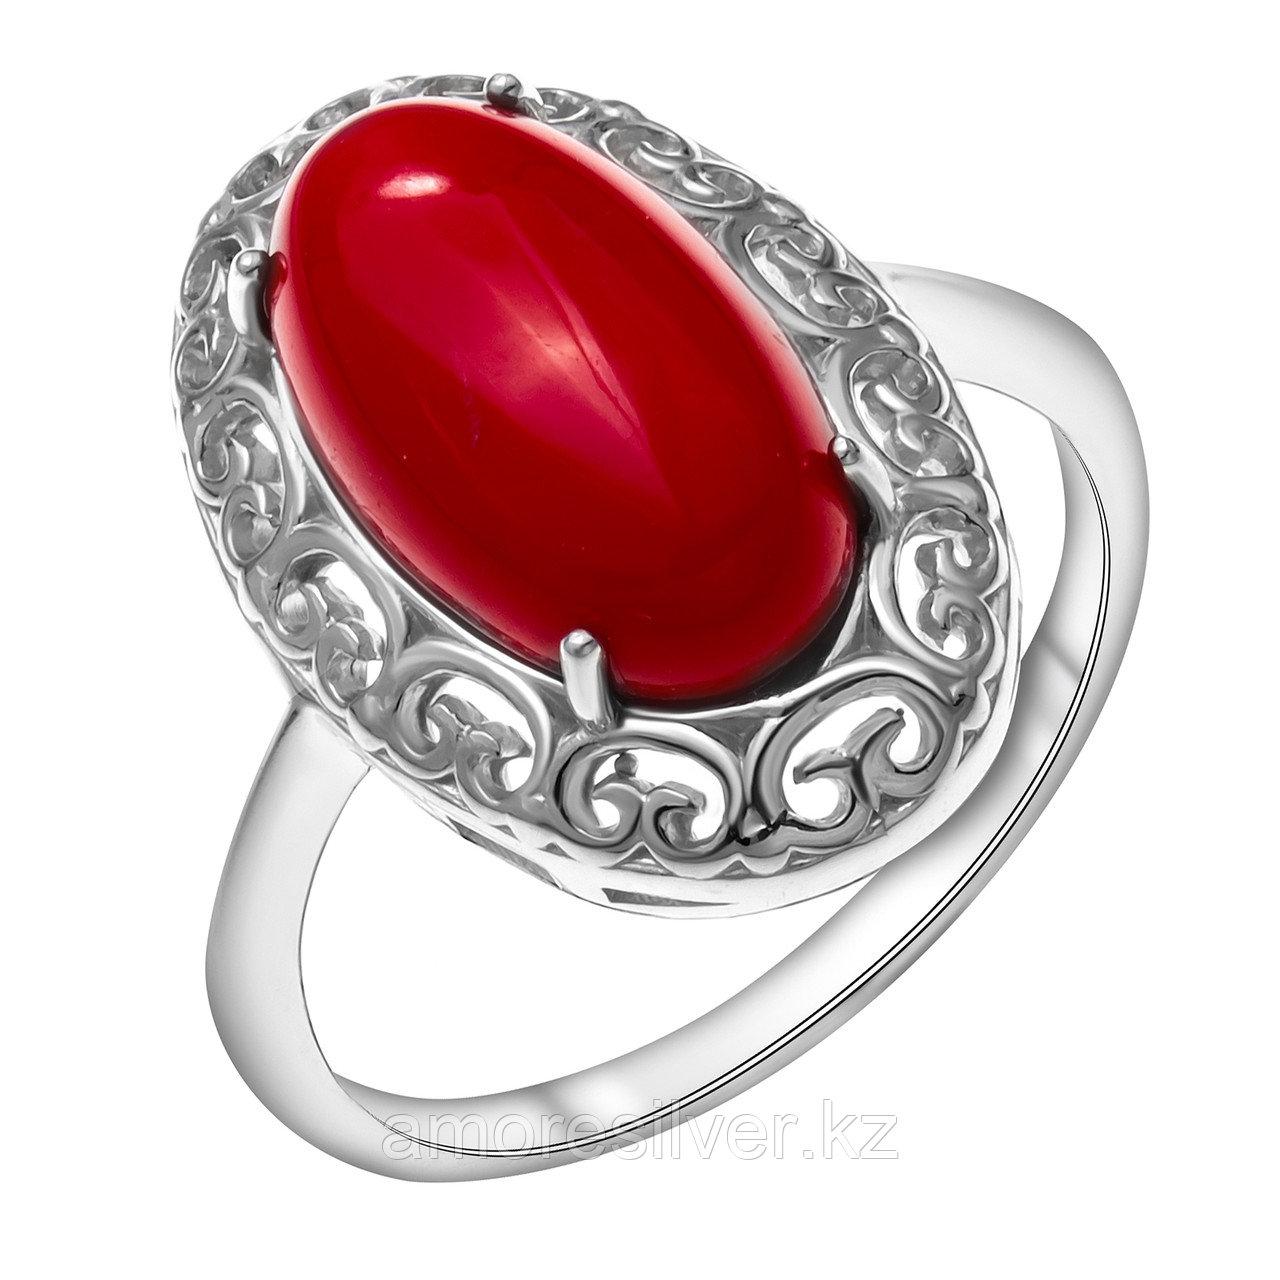 Кольцо Приволжский ювелир серебро с родием, коралл, овал 261323-CRL